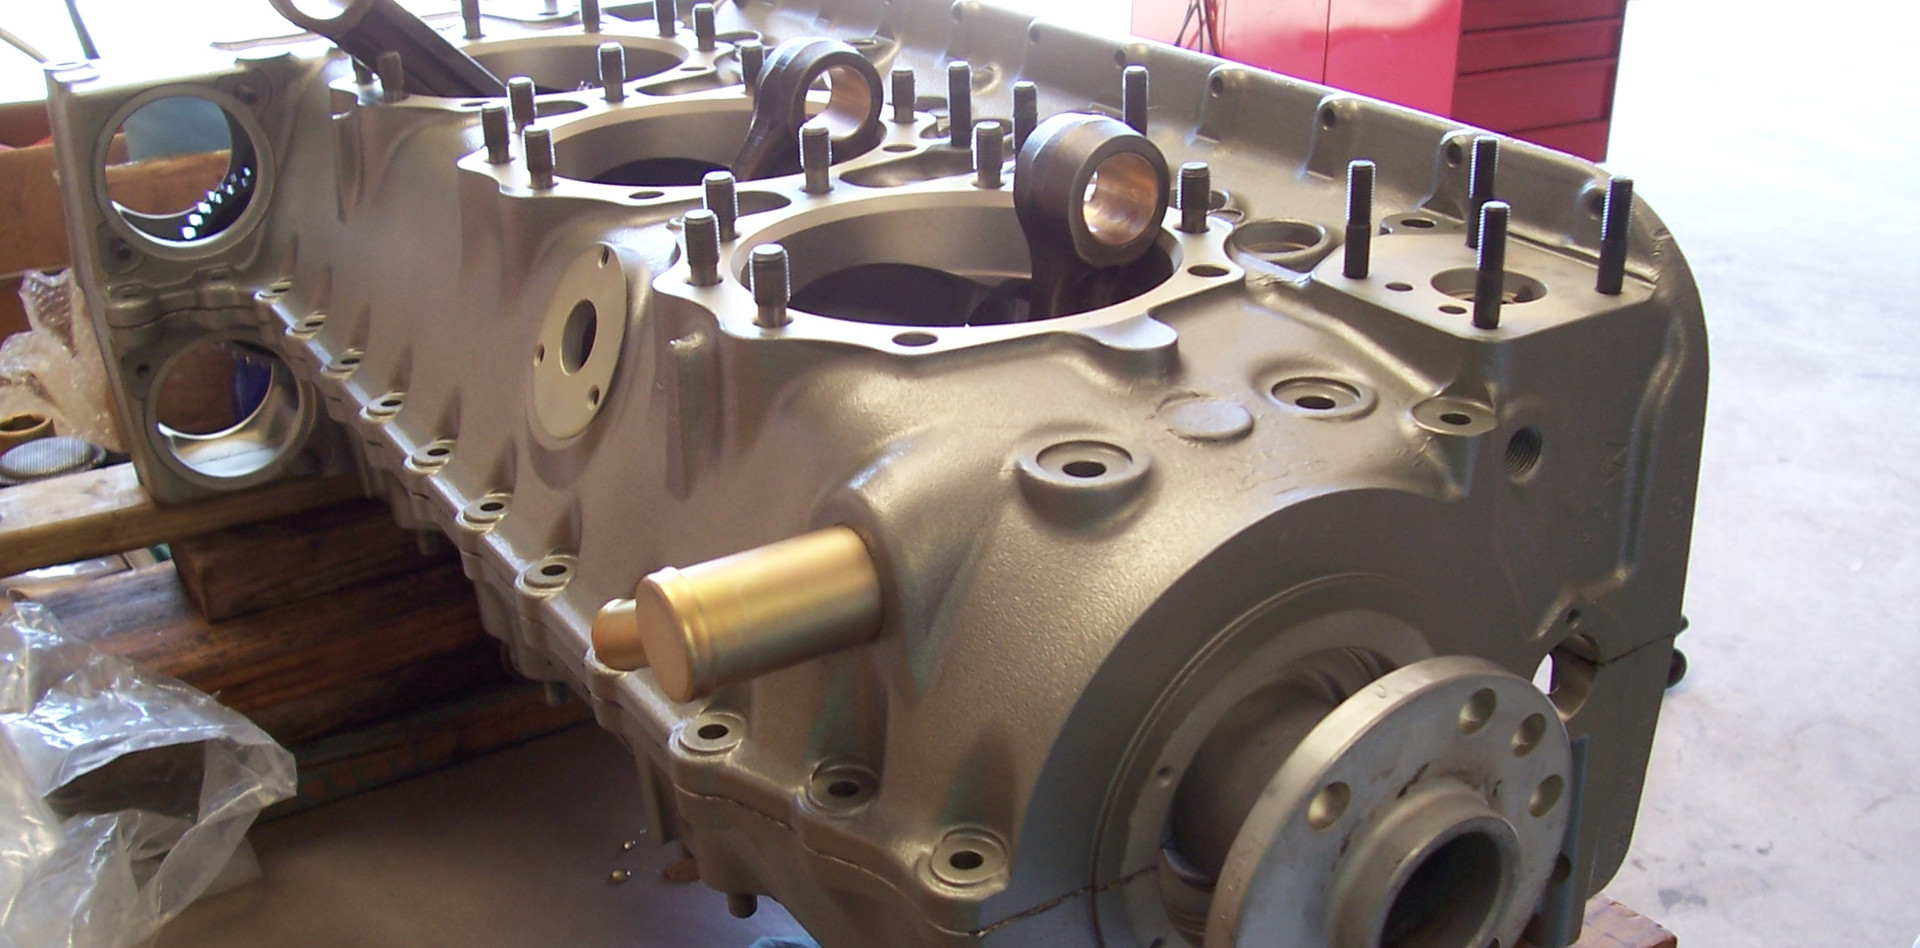 Engine Build P-Ponk 520